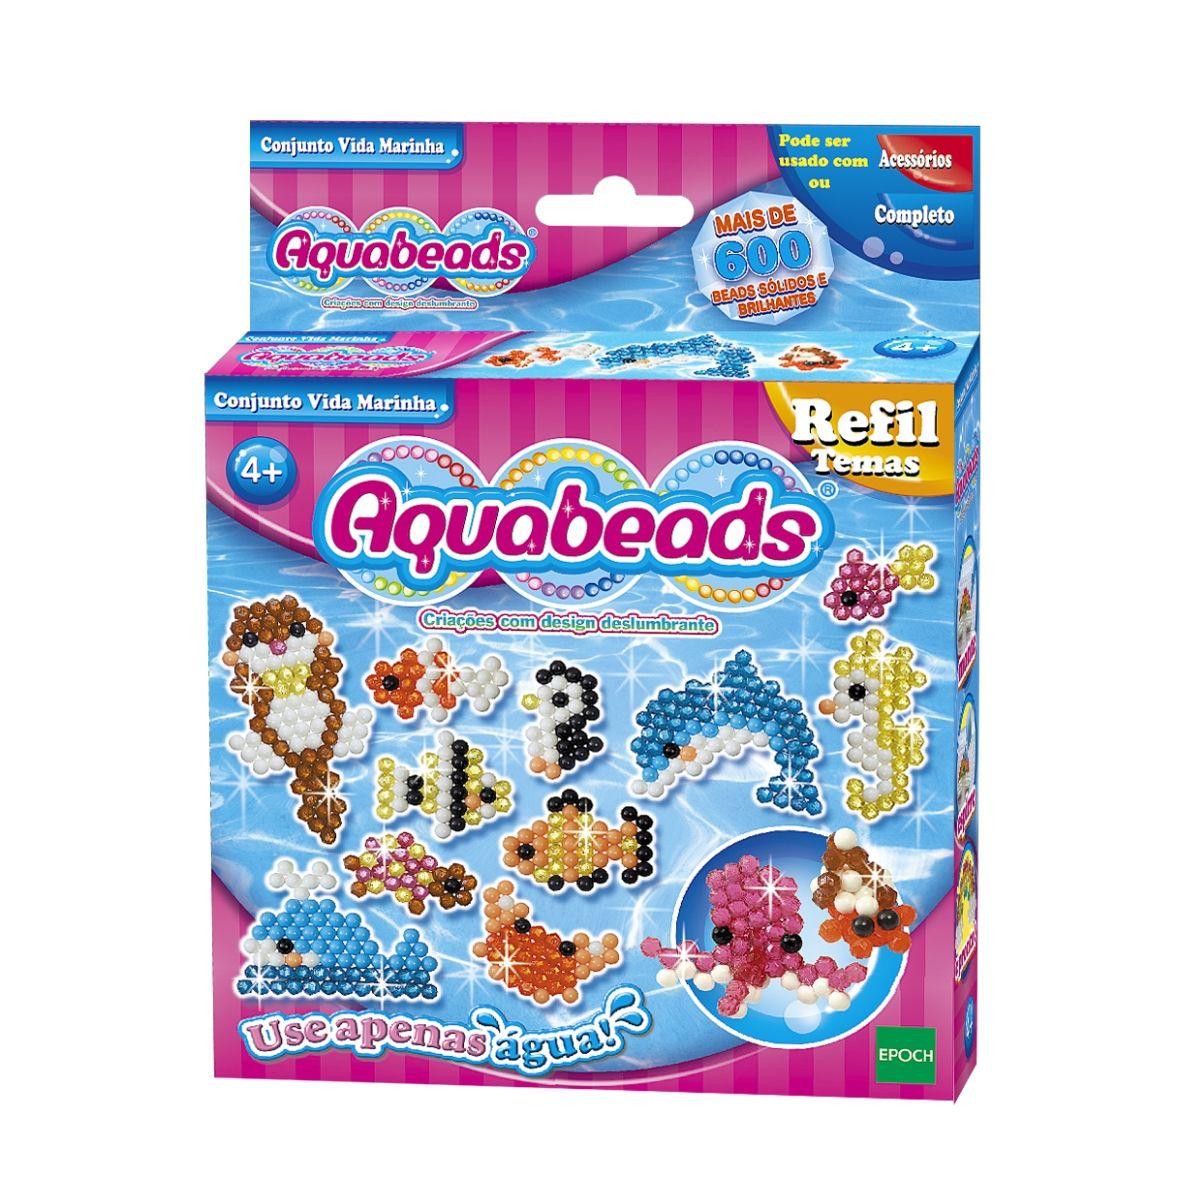 Kit Combo Aquabeads Caixa Safari + Conjunto Vida Marinha  - Game Land Brinquedos